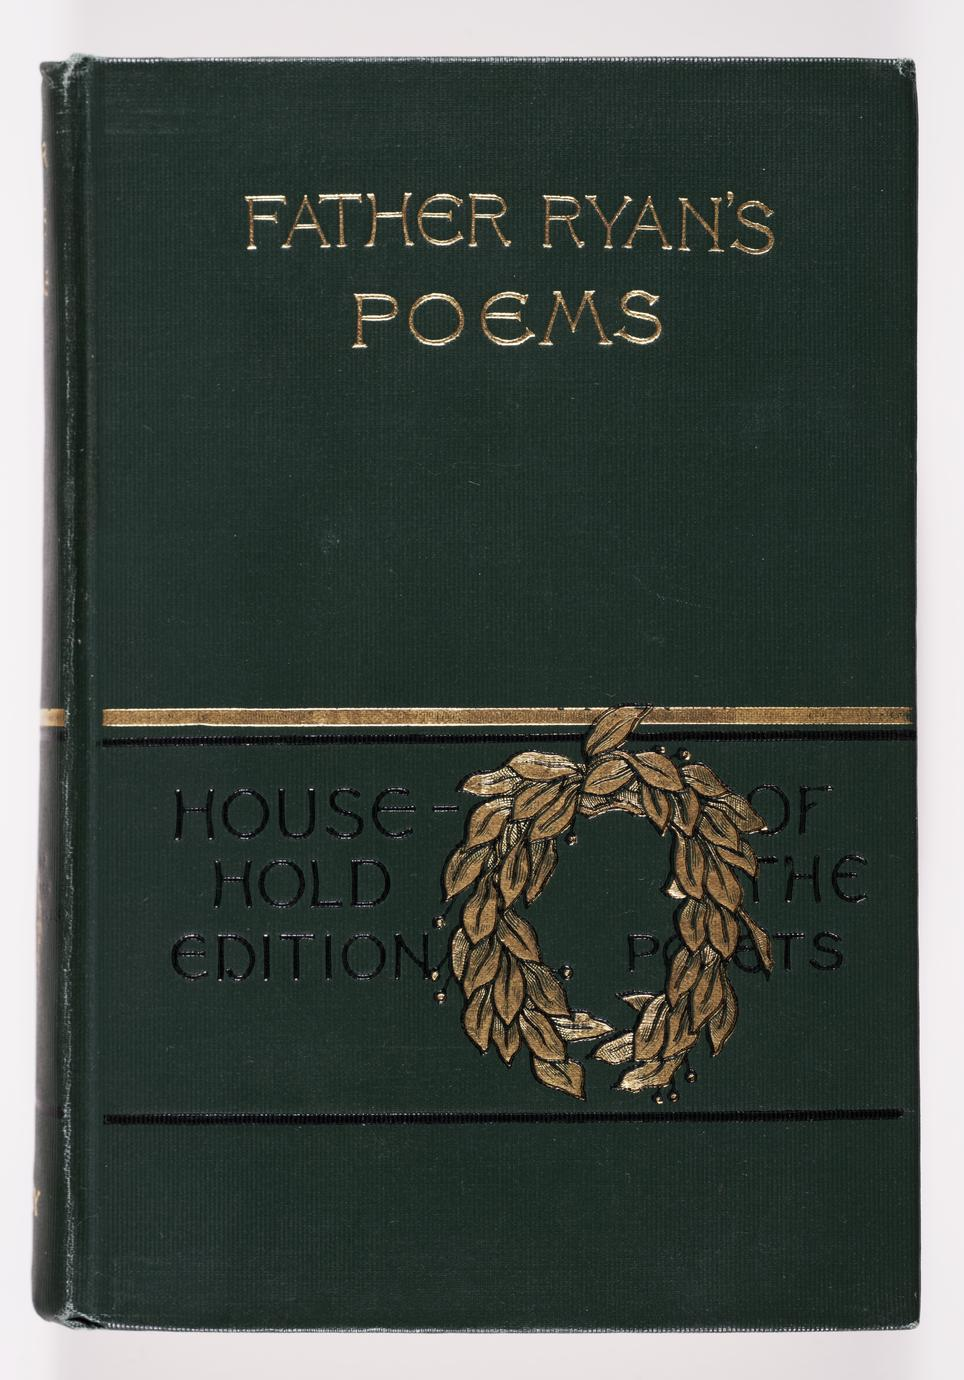 Poems : patriotic, religious, miscellaneous (1 of 2)